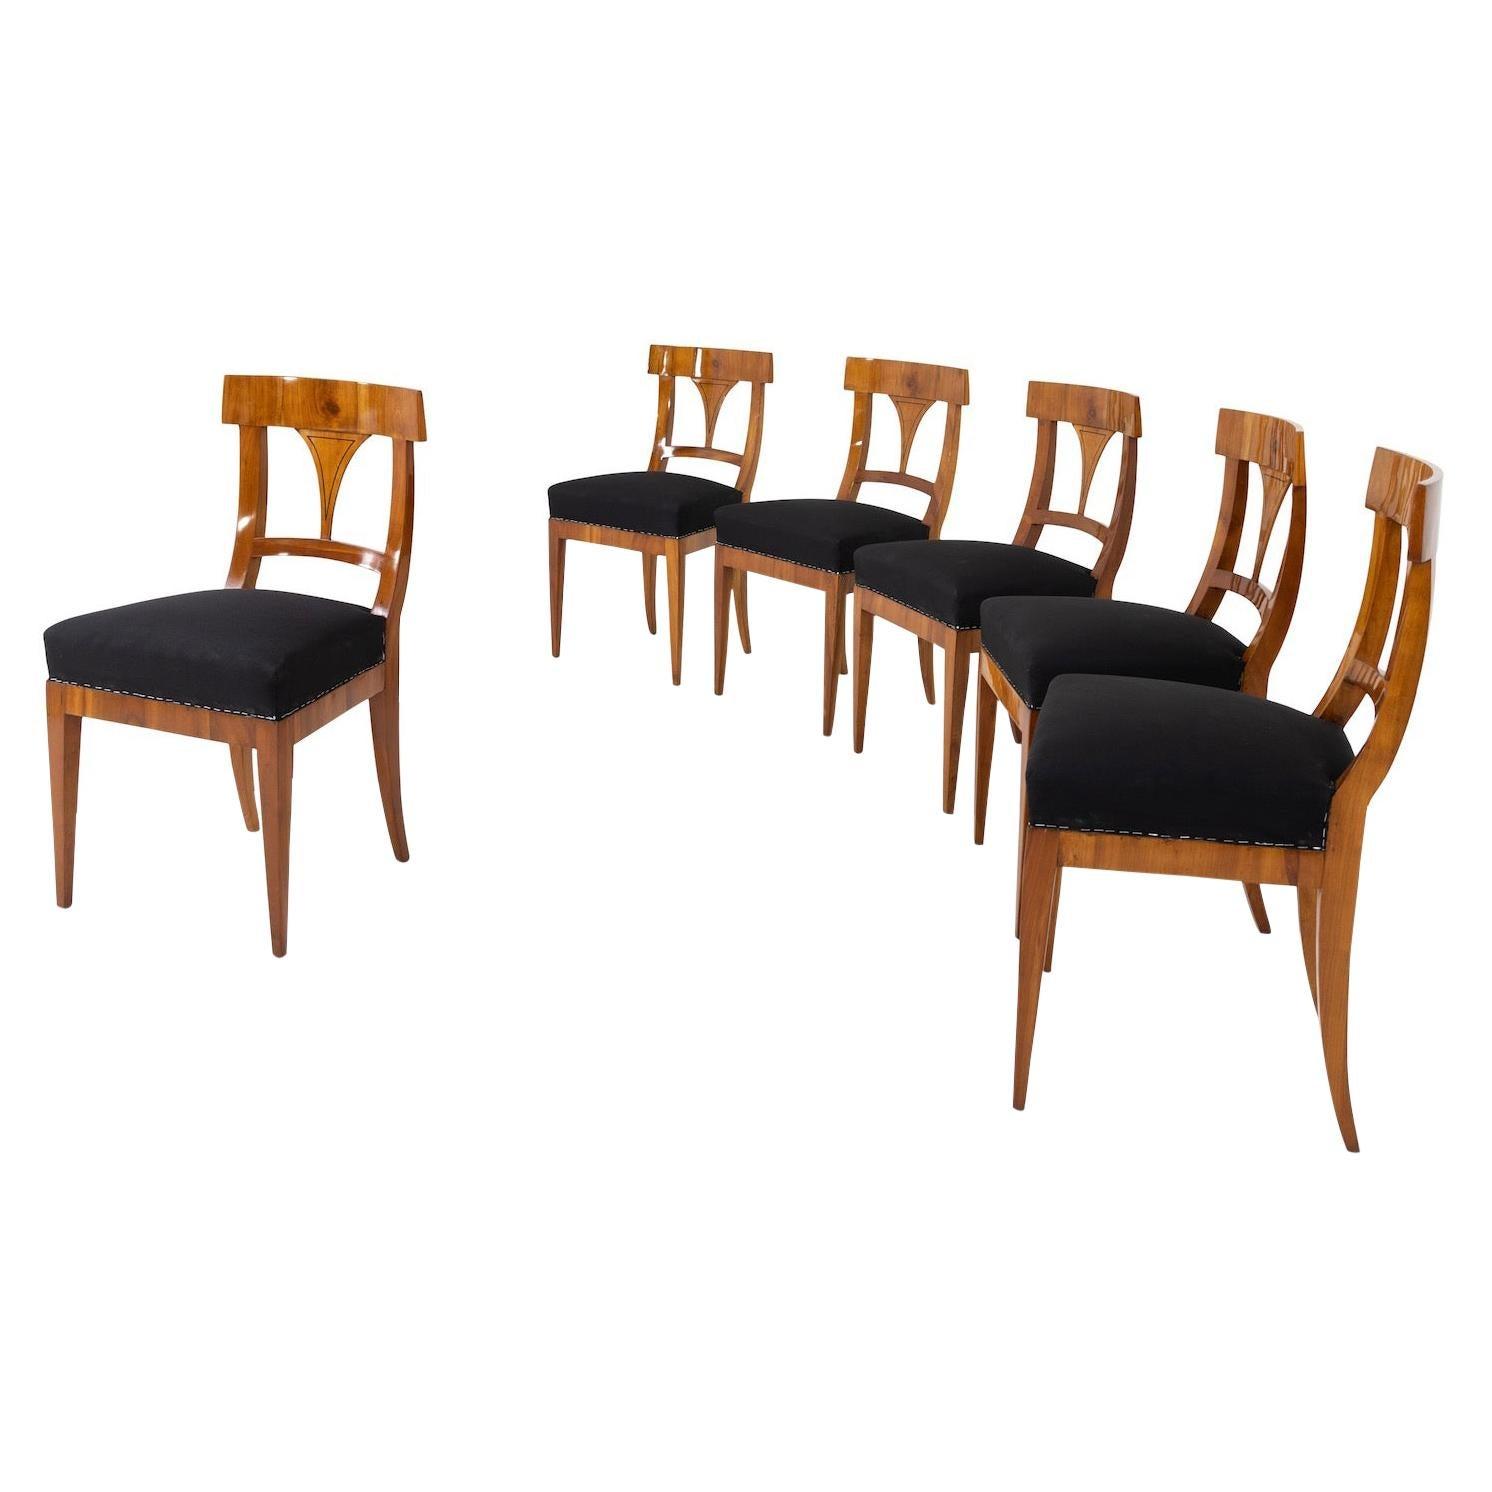 Biedermeier Dining Room Chairs, around 1820